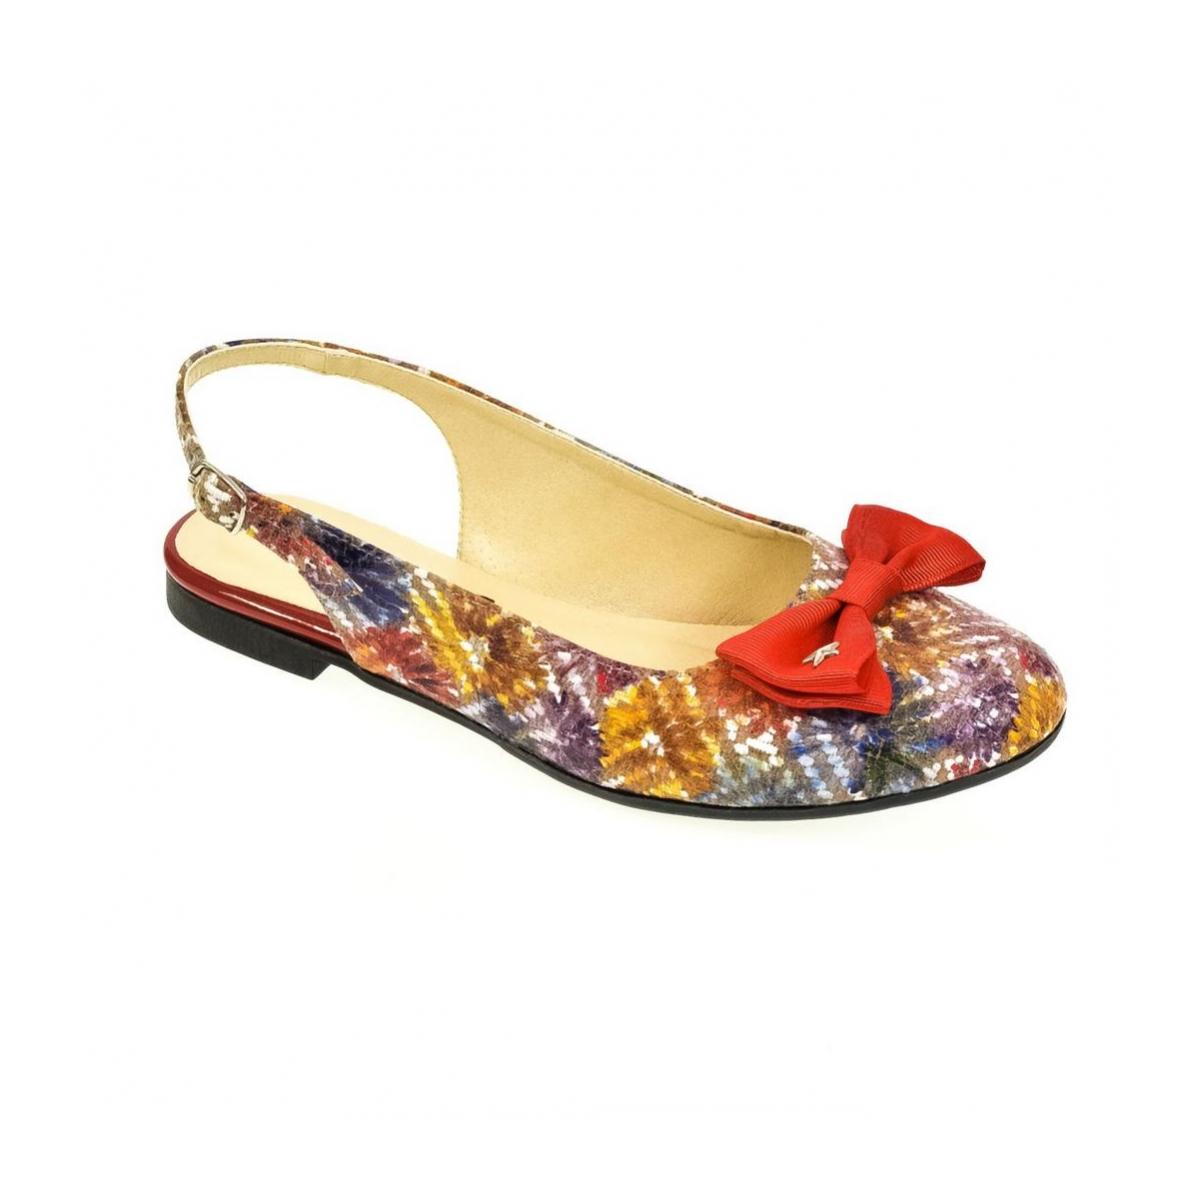 447a87343466 Dámske farebné sandále SIARA - 4